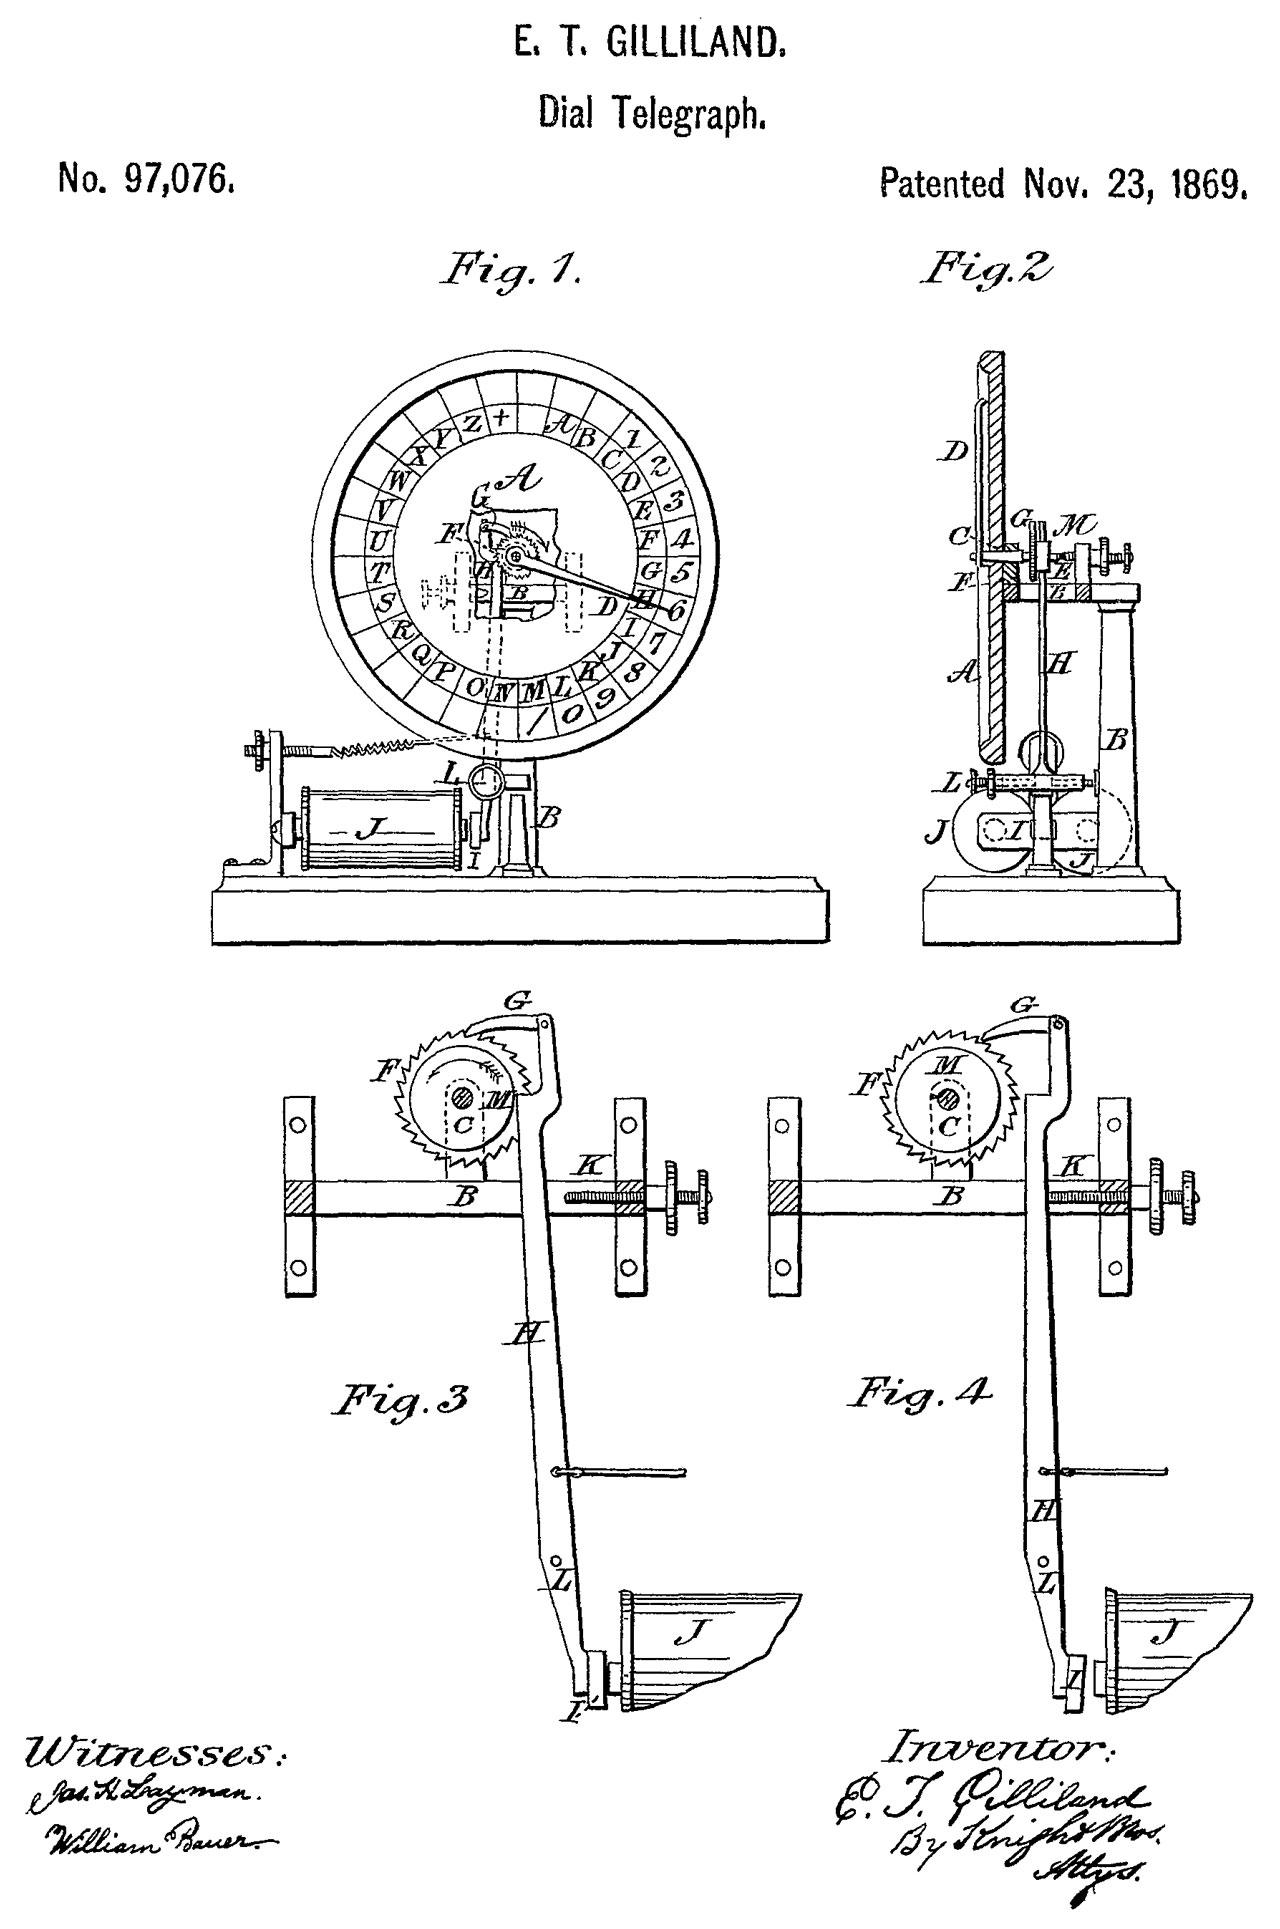 hight resolution of 97076 dial telegraph apparatus e t gilliland